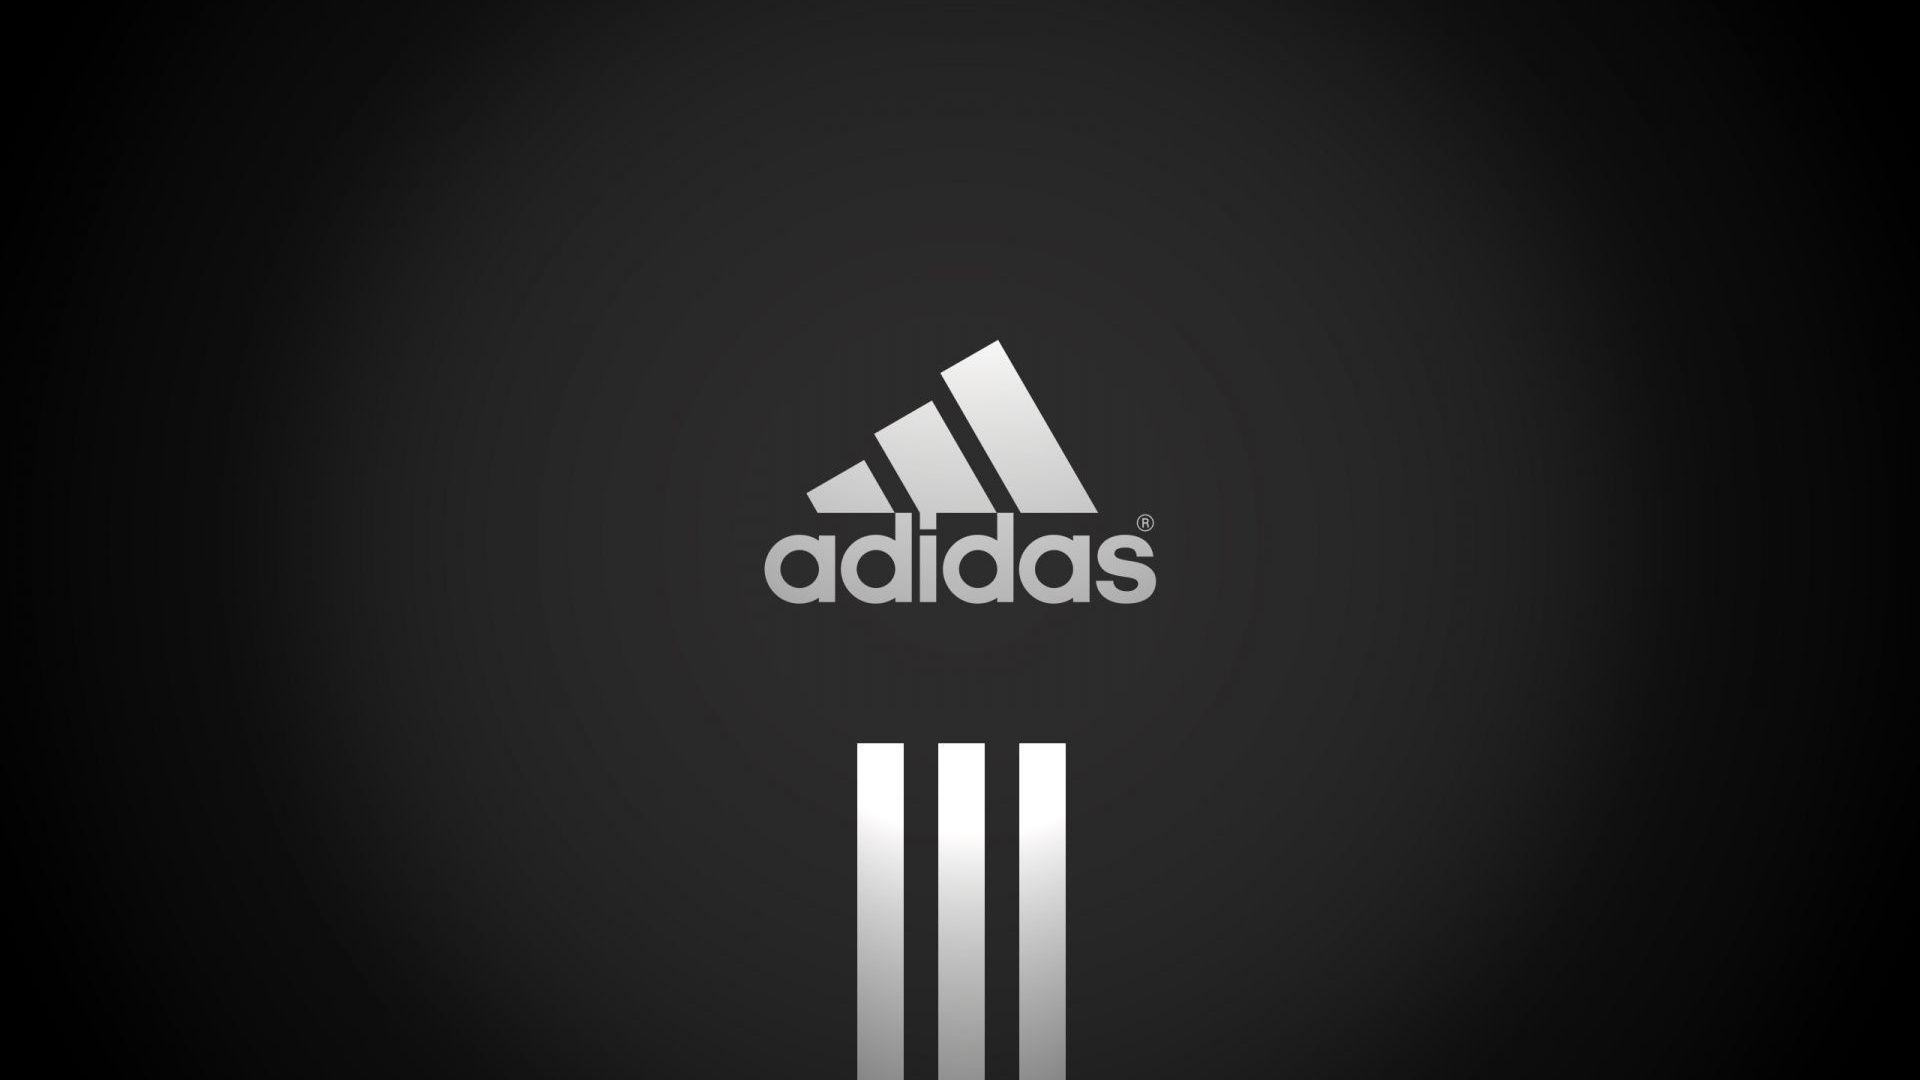 Adidas Black 1080p Hd Logo Desktop Wallpaper Places To Visit